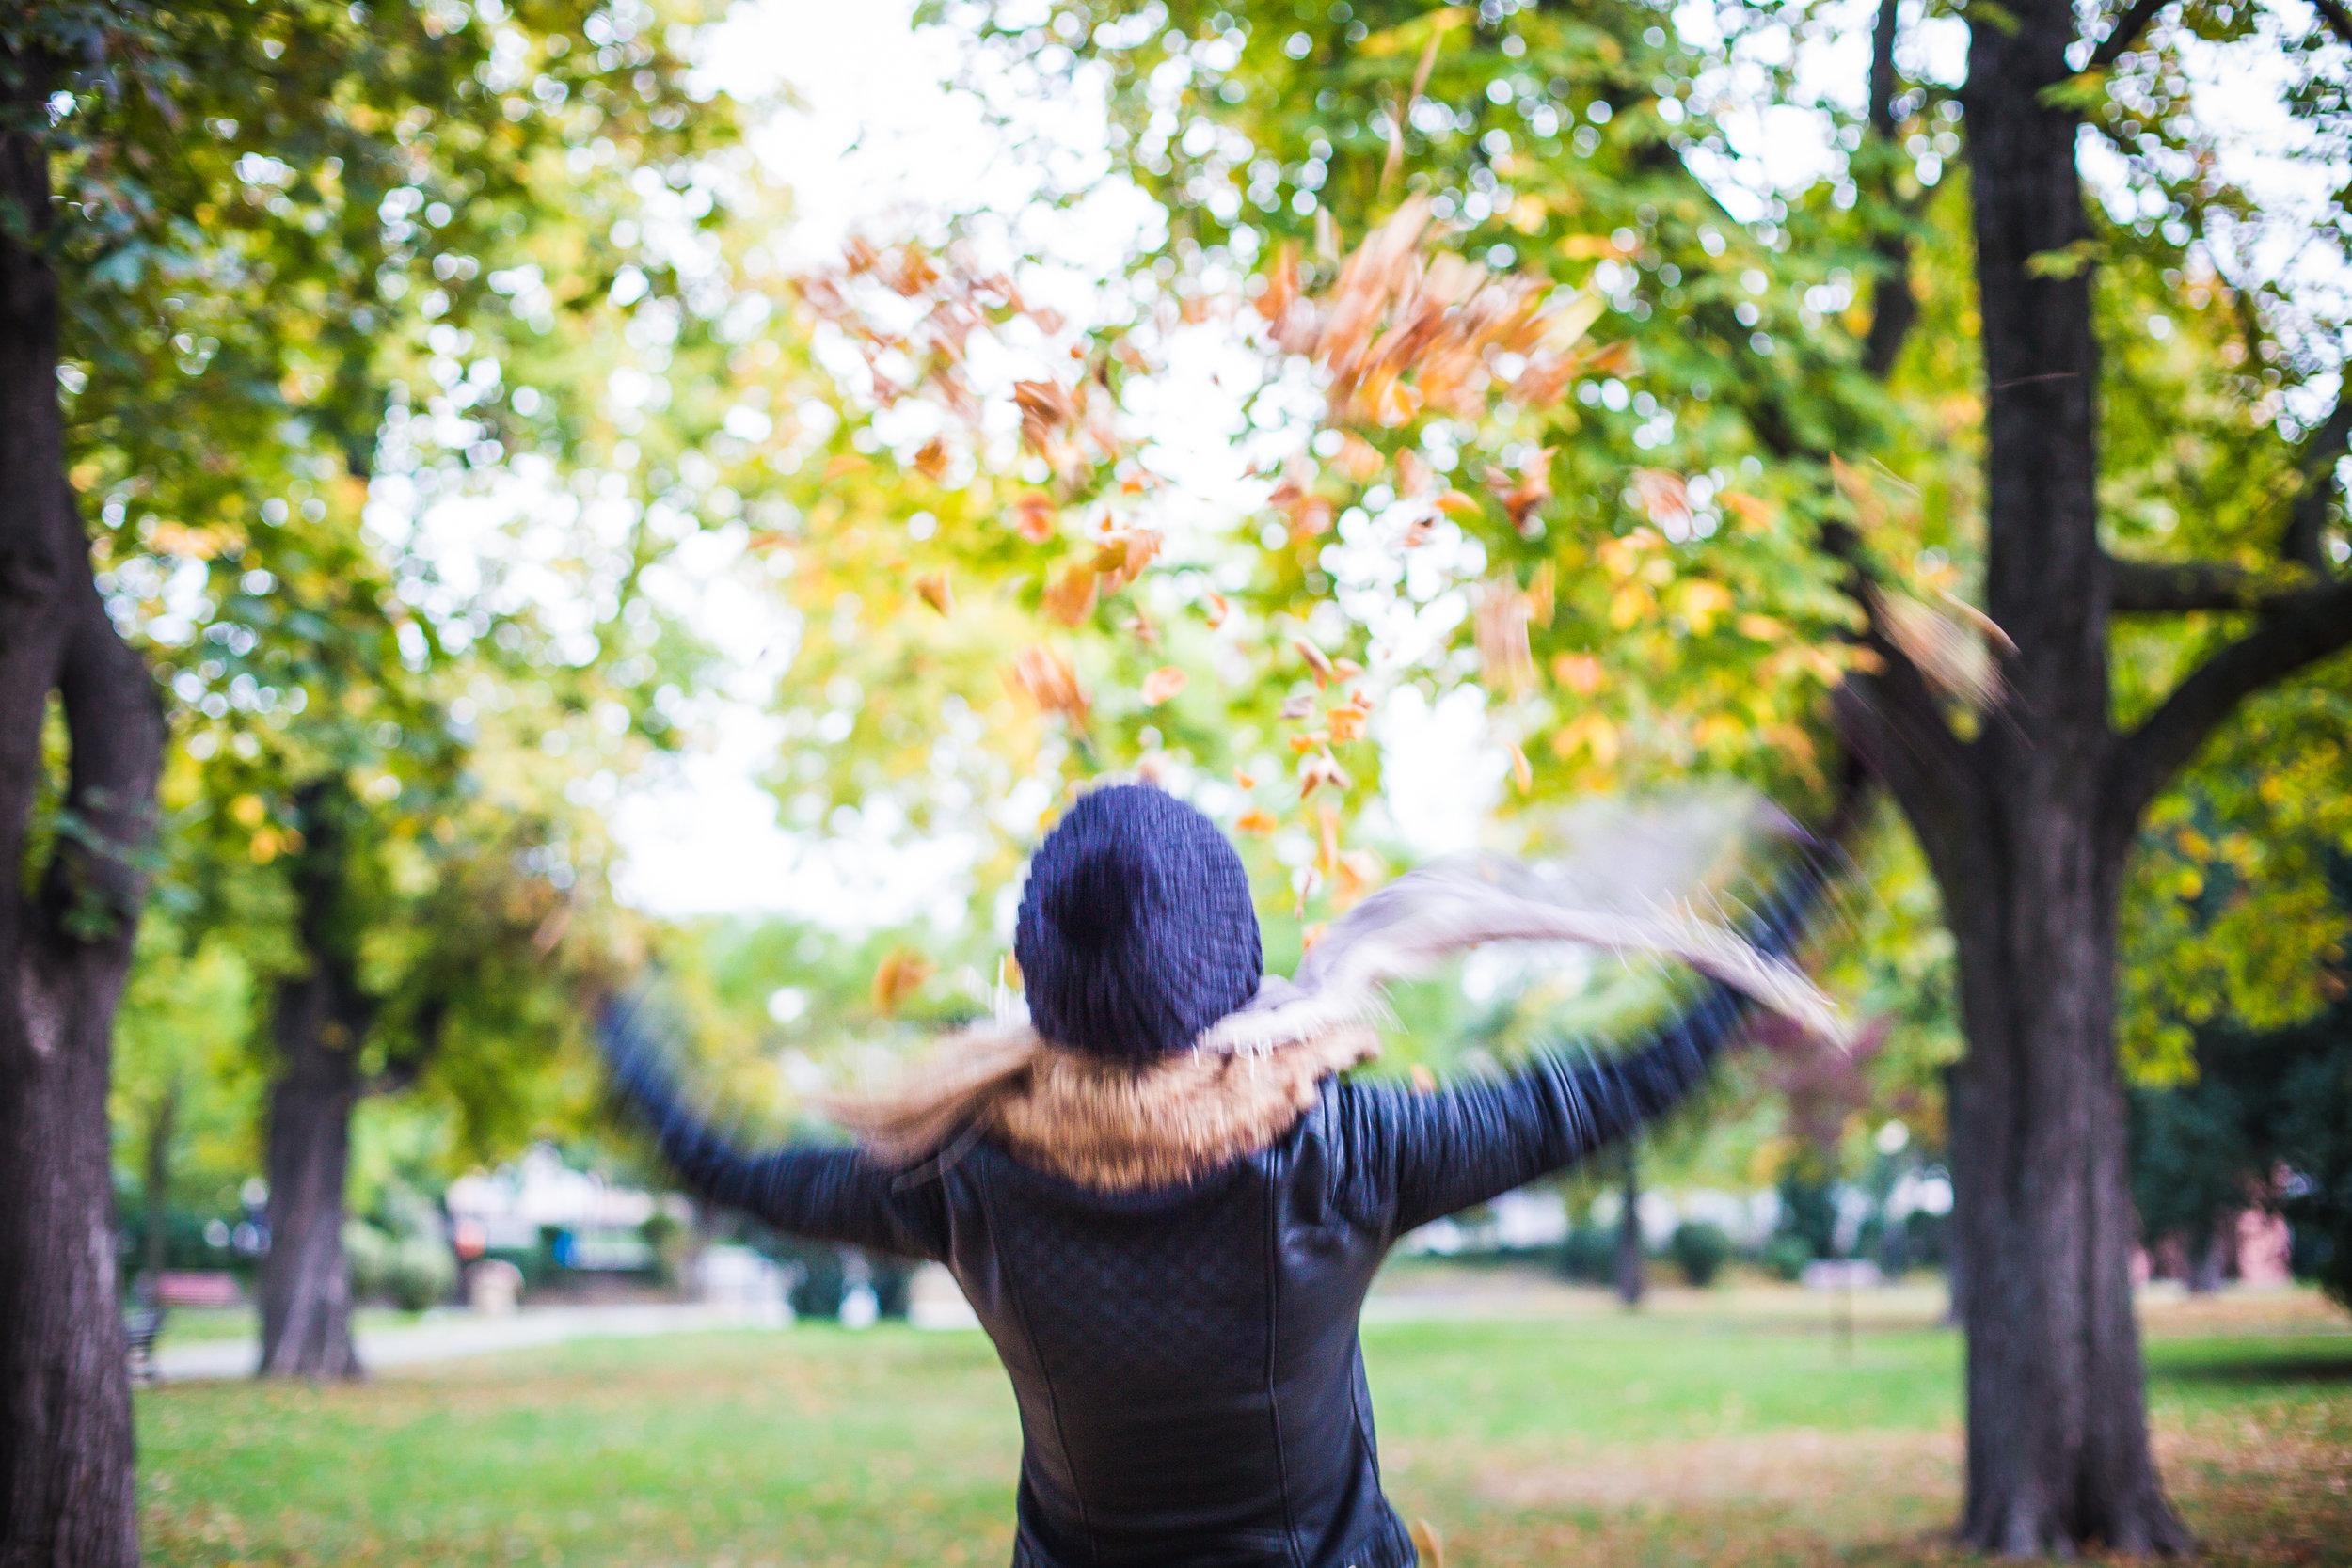 girl-throwing-autumn-leaves-in-the-air-picjumbo-com.jpg